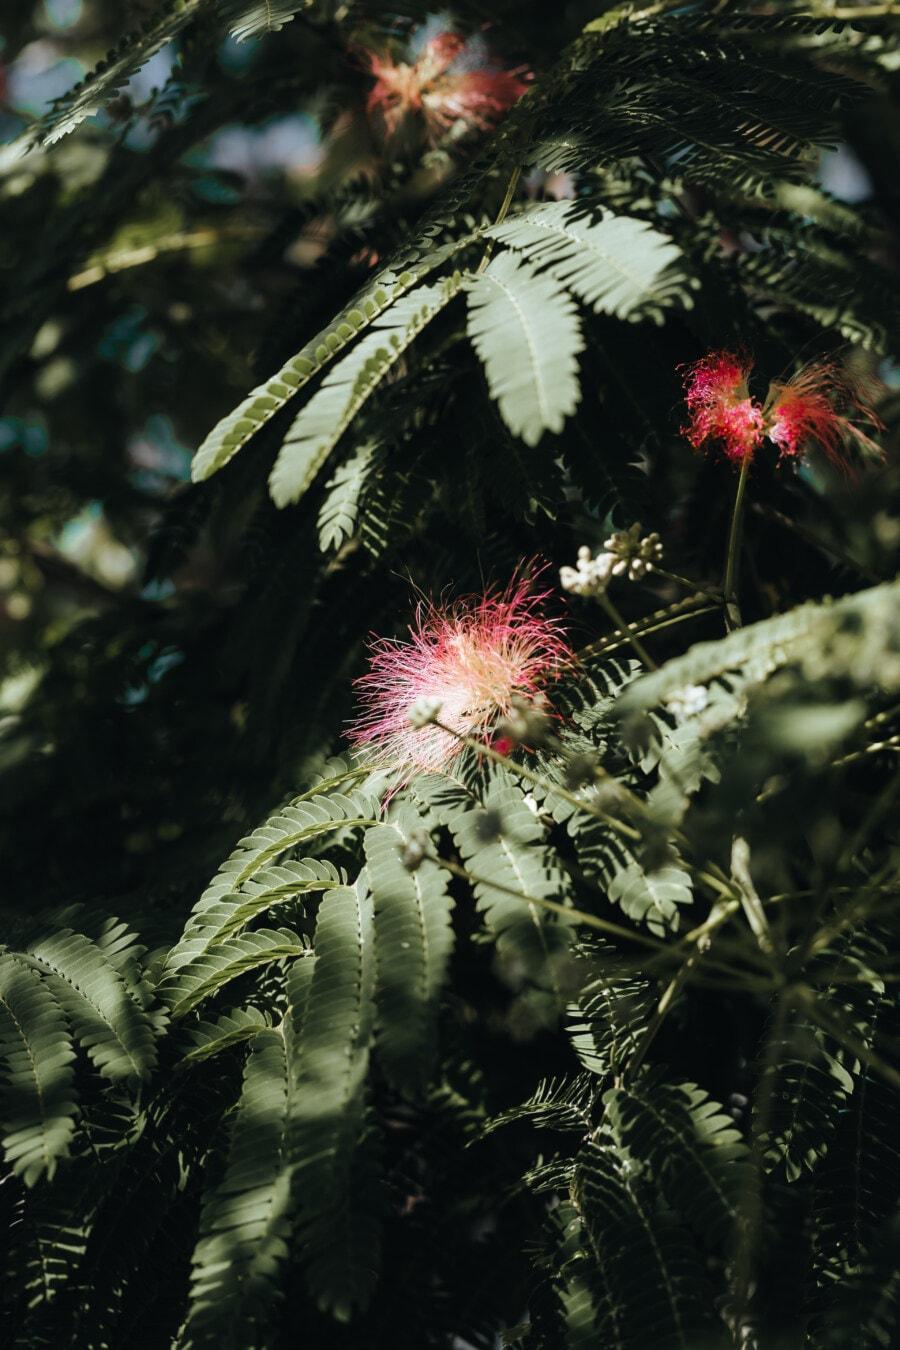 branches, shade, shadow, green leaves, flowers, pinkish, shrub, plant, tree, nature